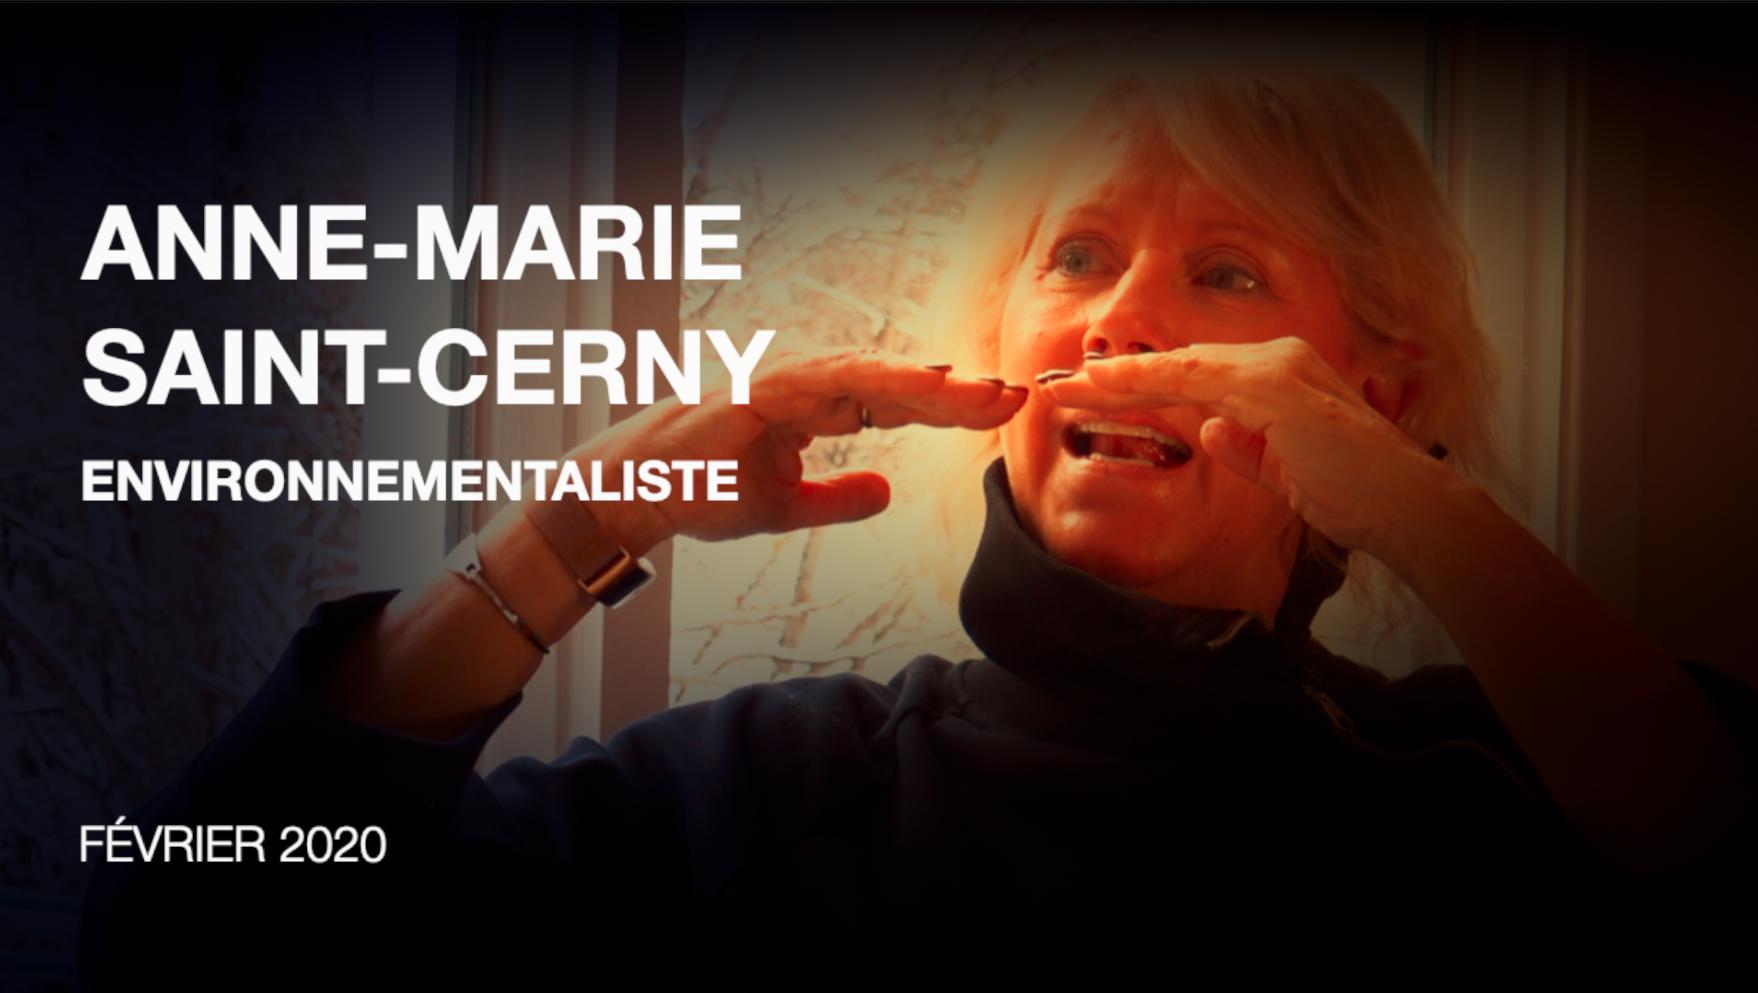 Anne-Marie Saint-Cerny